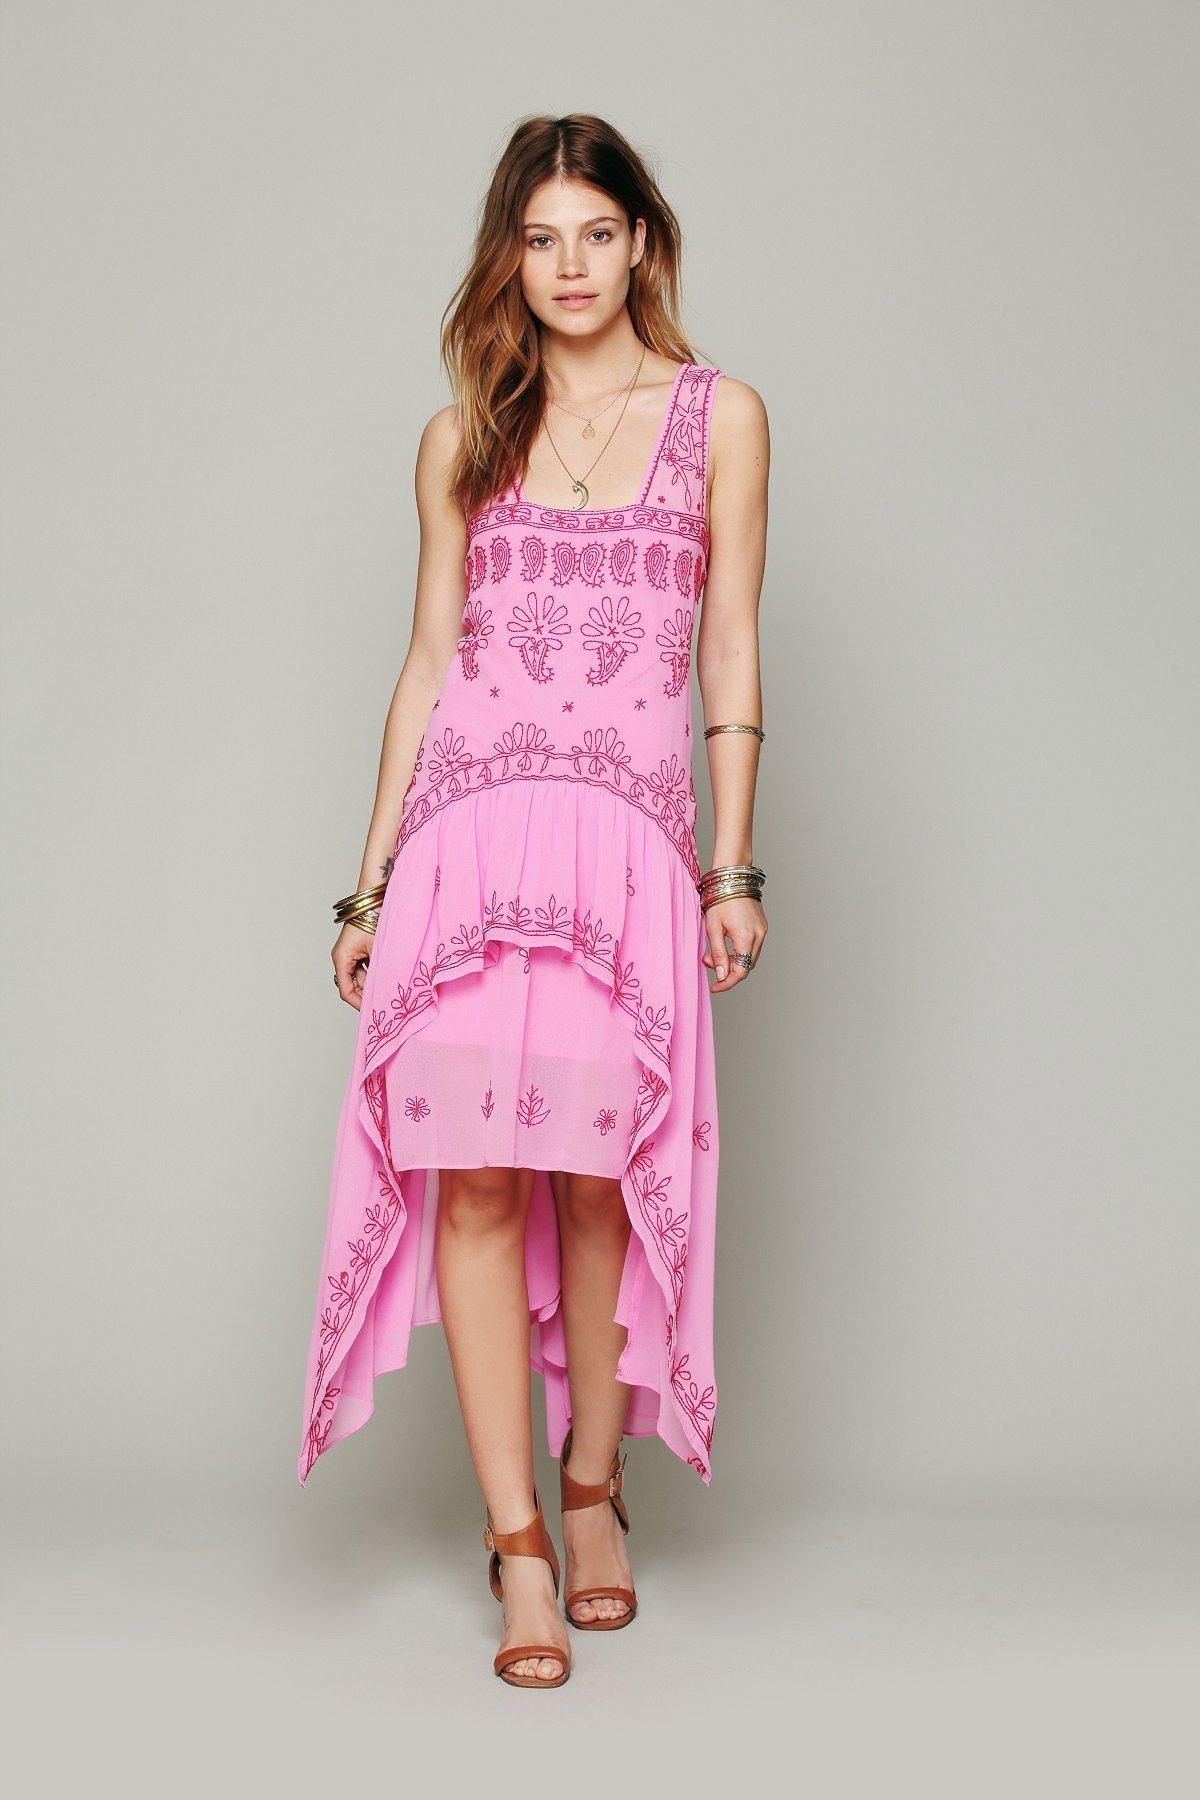 FP New Romantics Cassiopeia Embroidered Dress